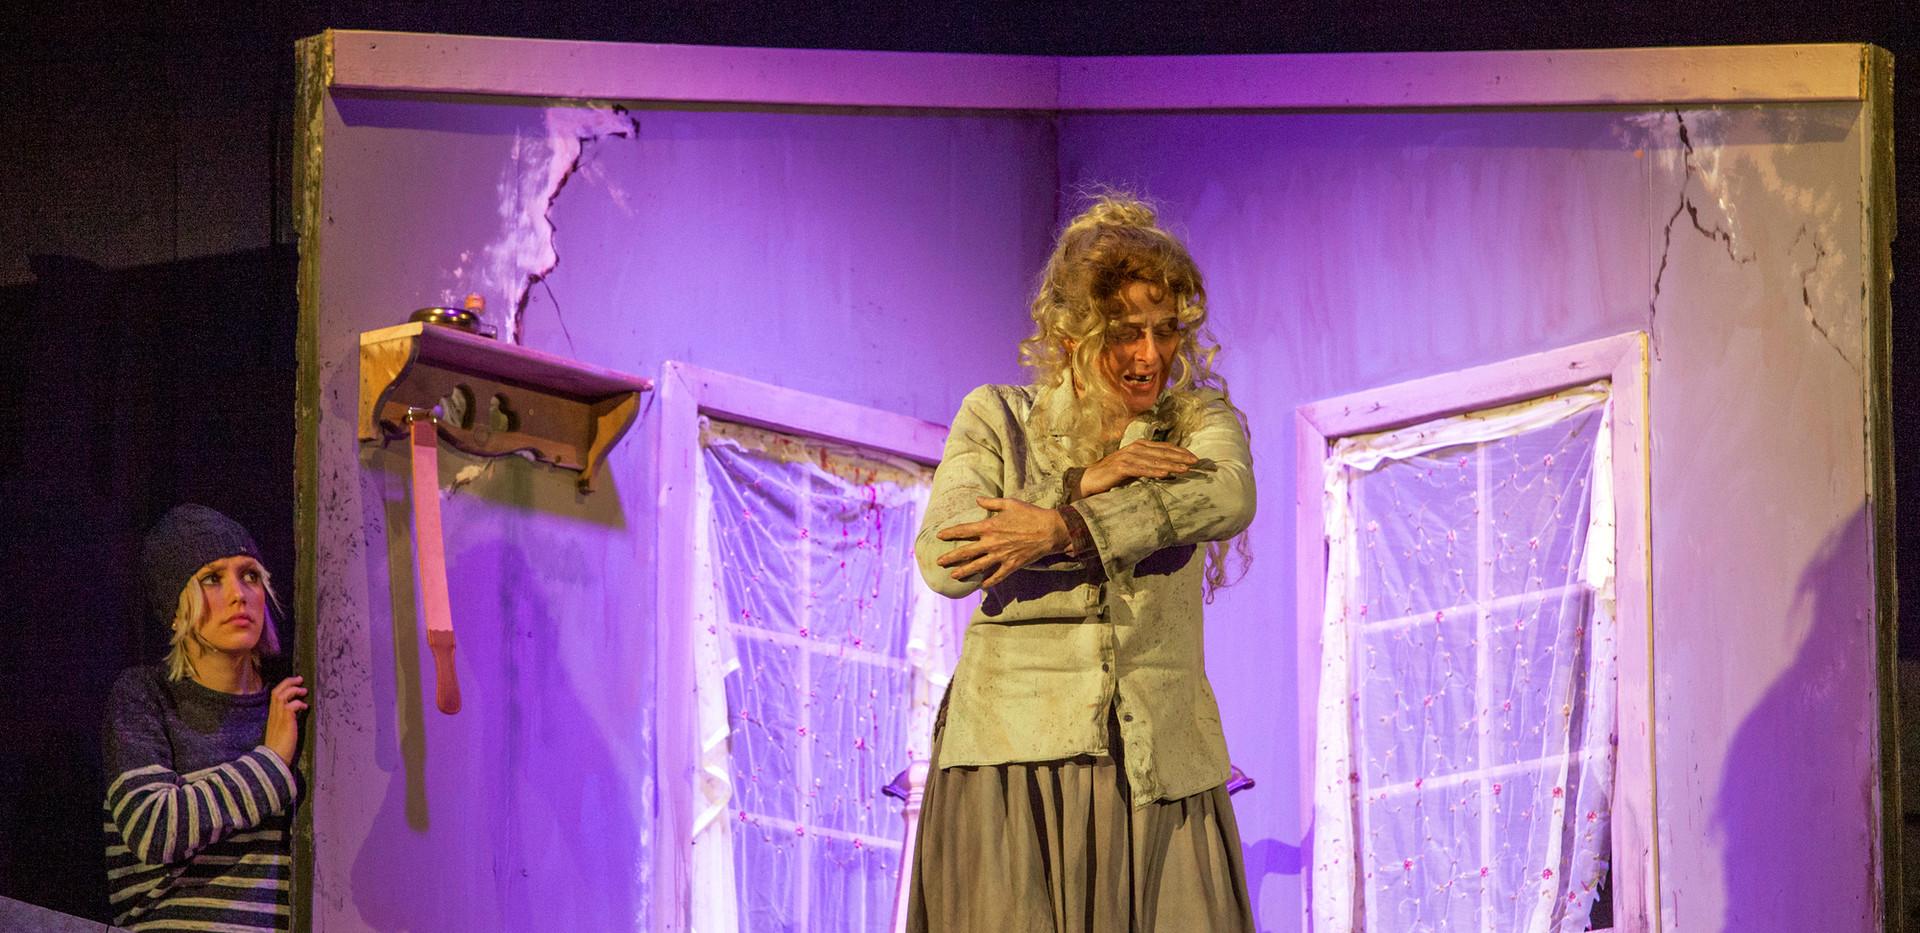 Johanna in disguise & Beggar Woman